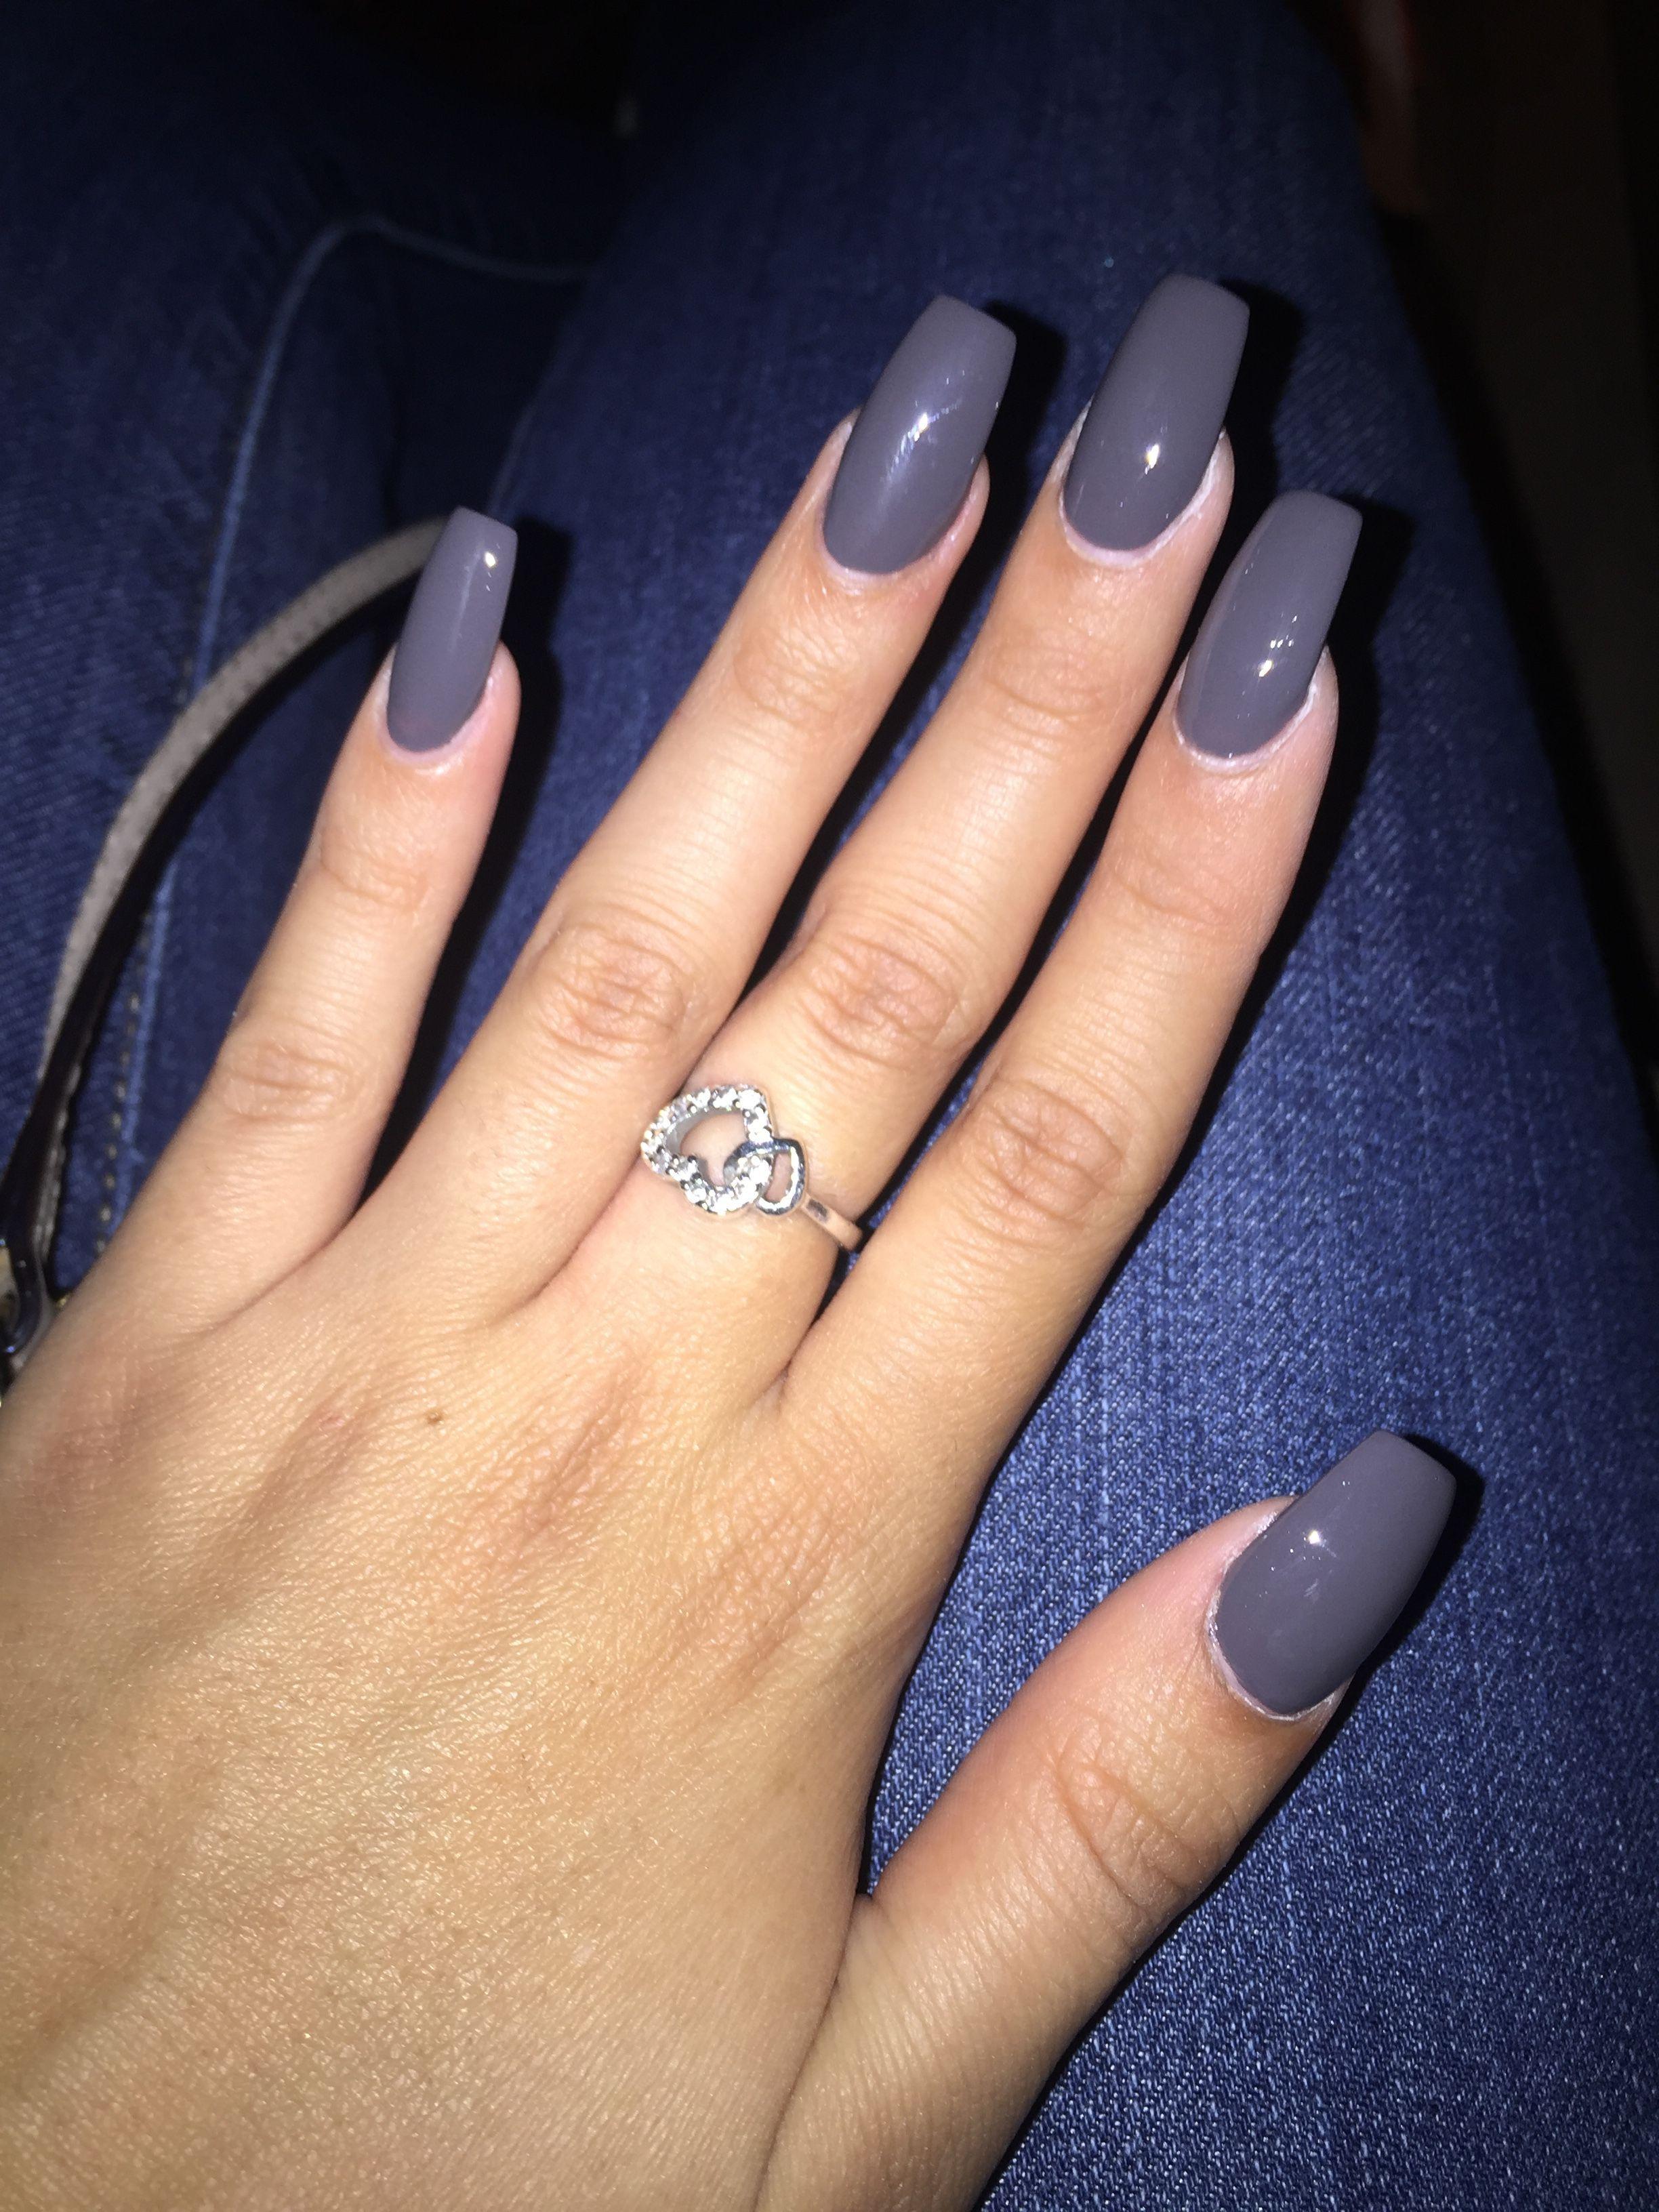 Gray nails acrylicnails nails gray nails nails